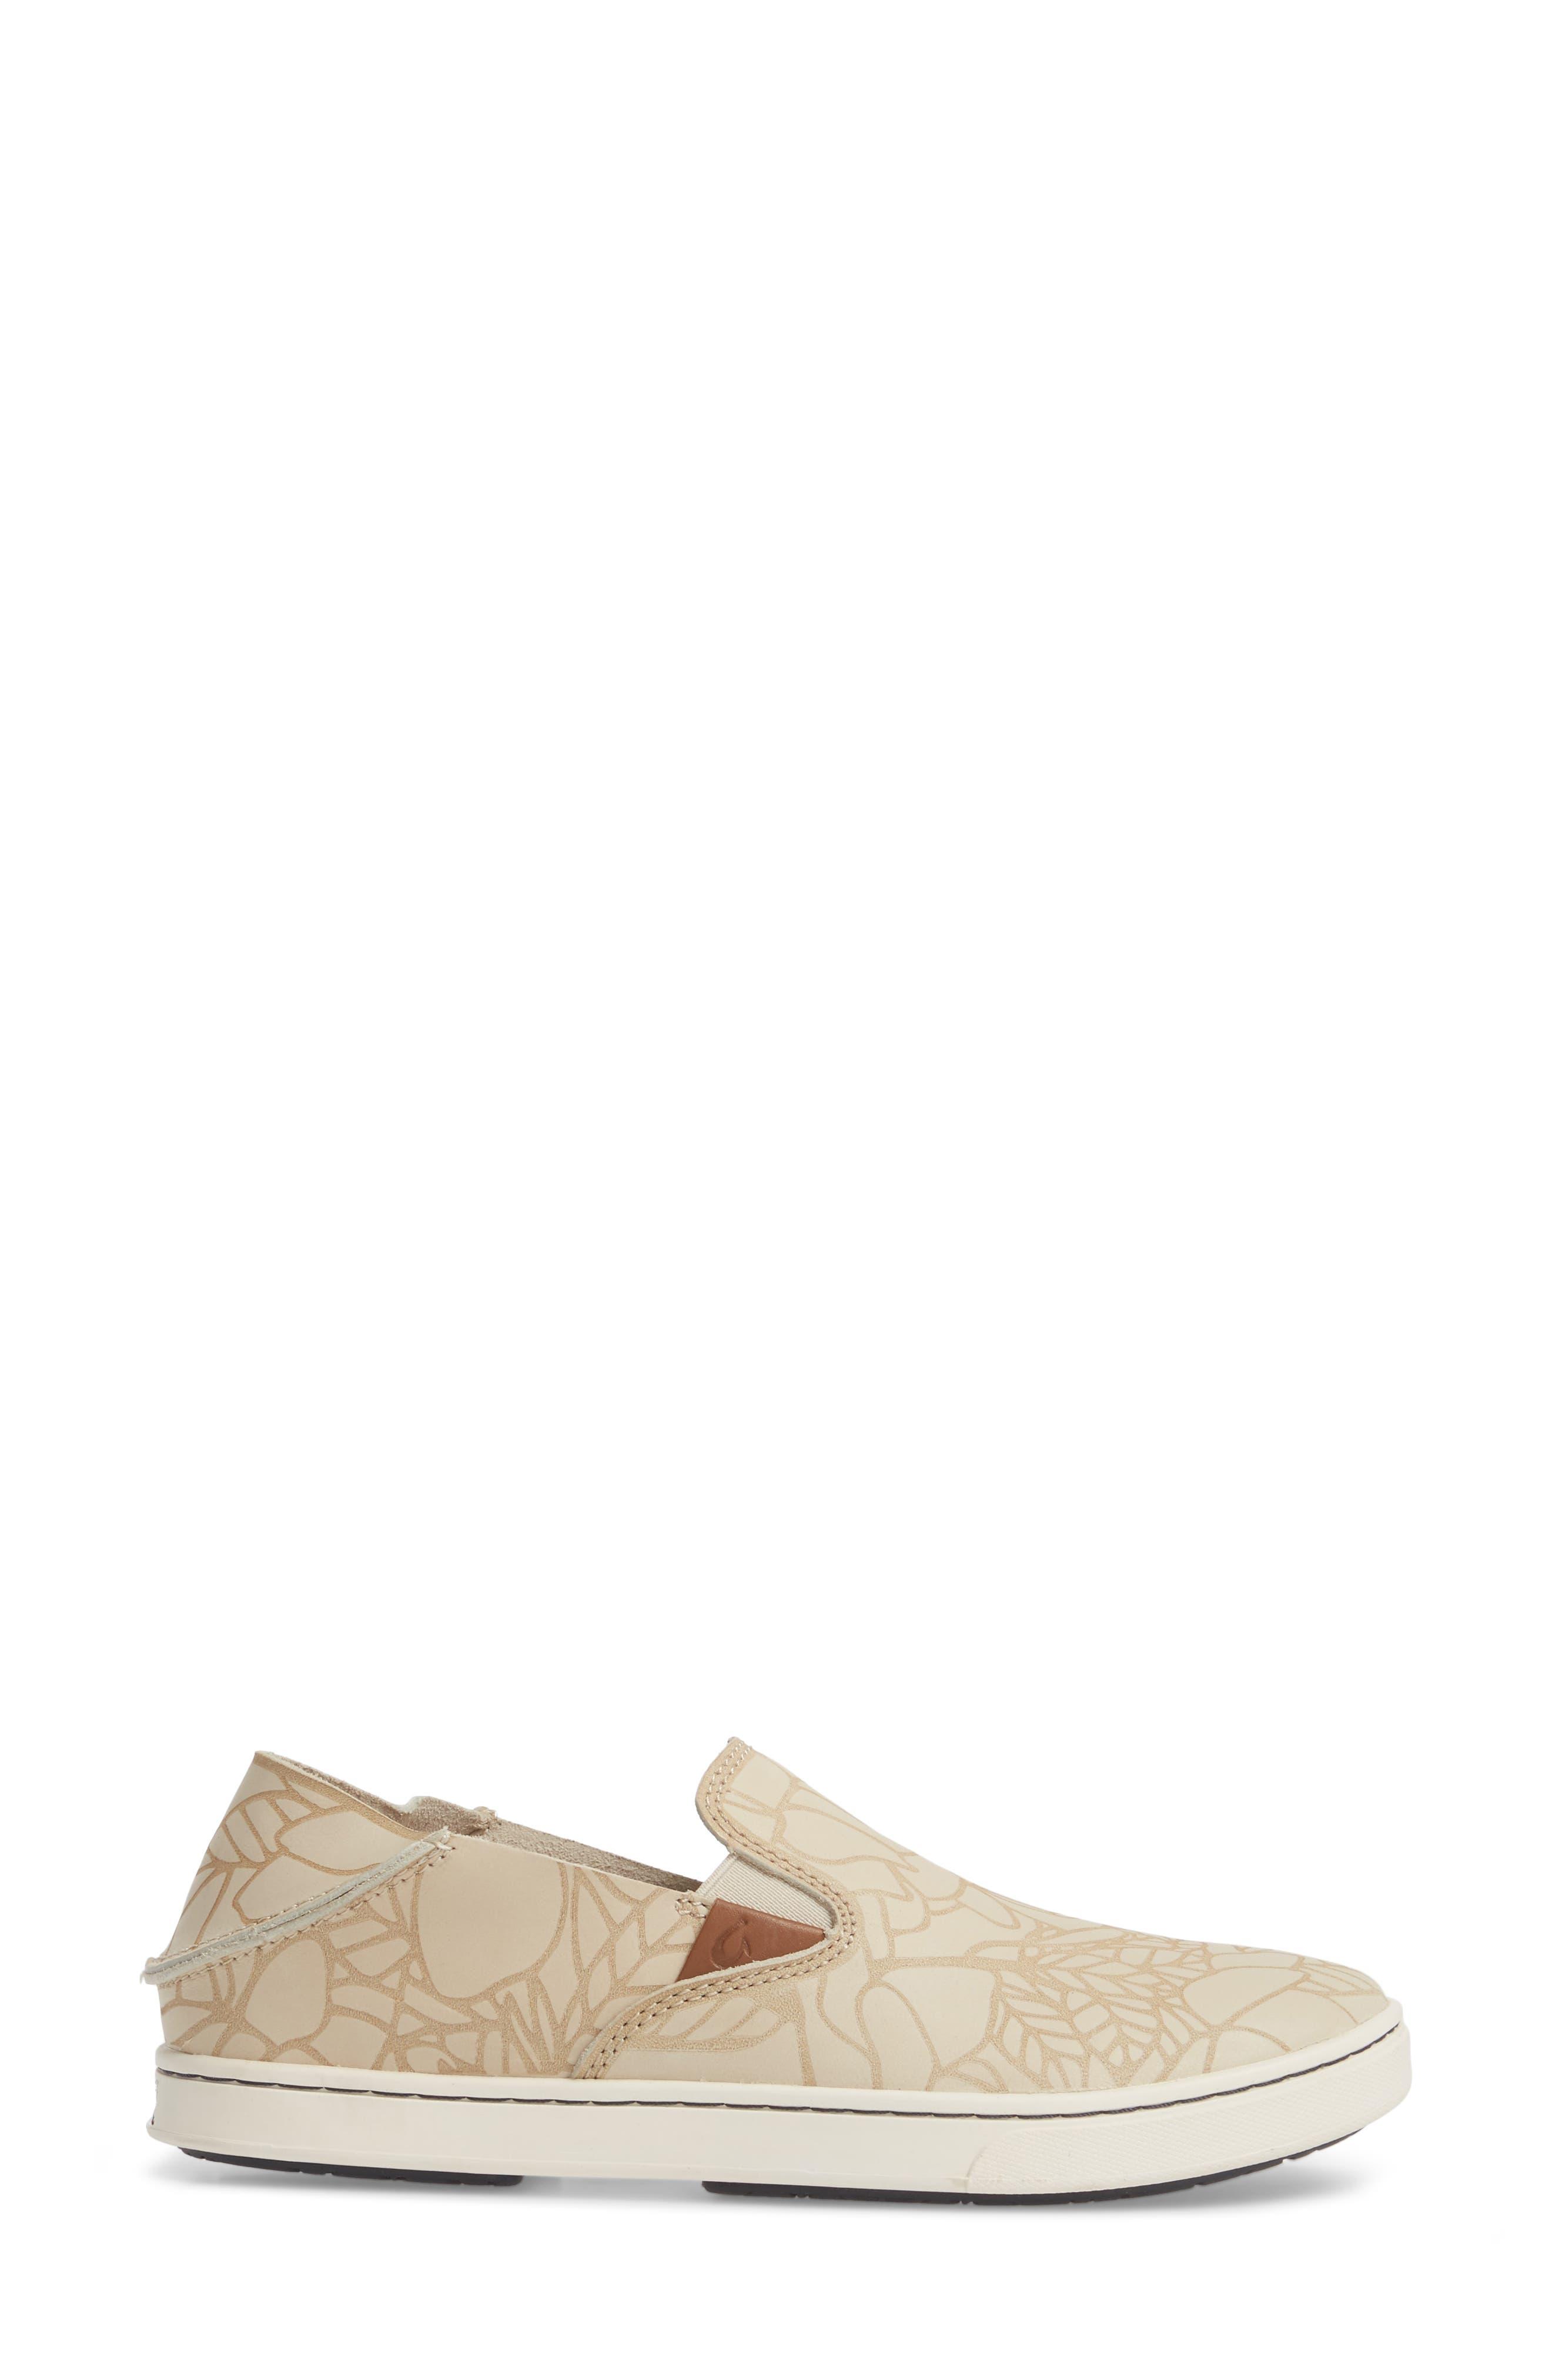 Pehuea Lau Slip-On Sneaker,                             Alternate thumbnail 2, color,                             TAPA/ TAPA FABRIC